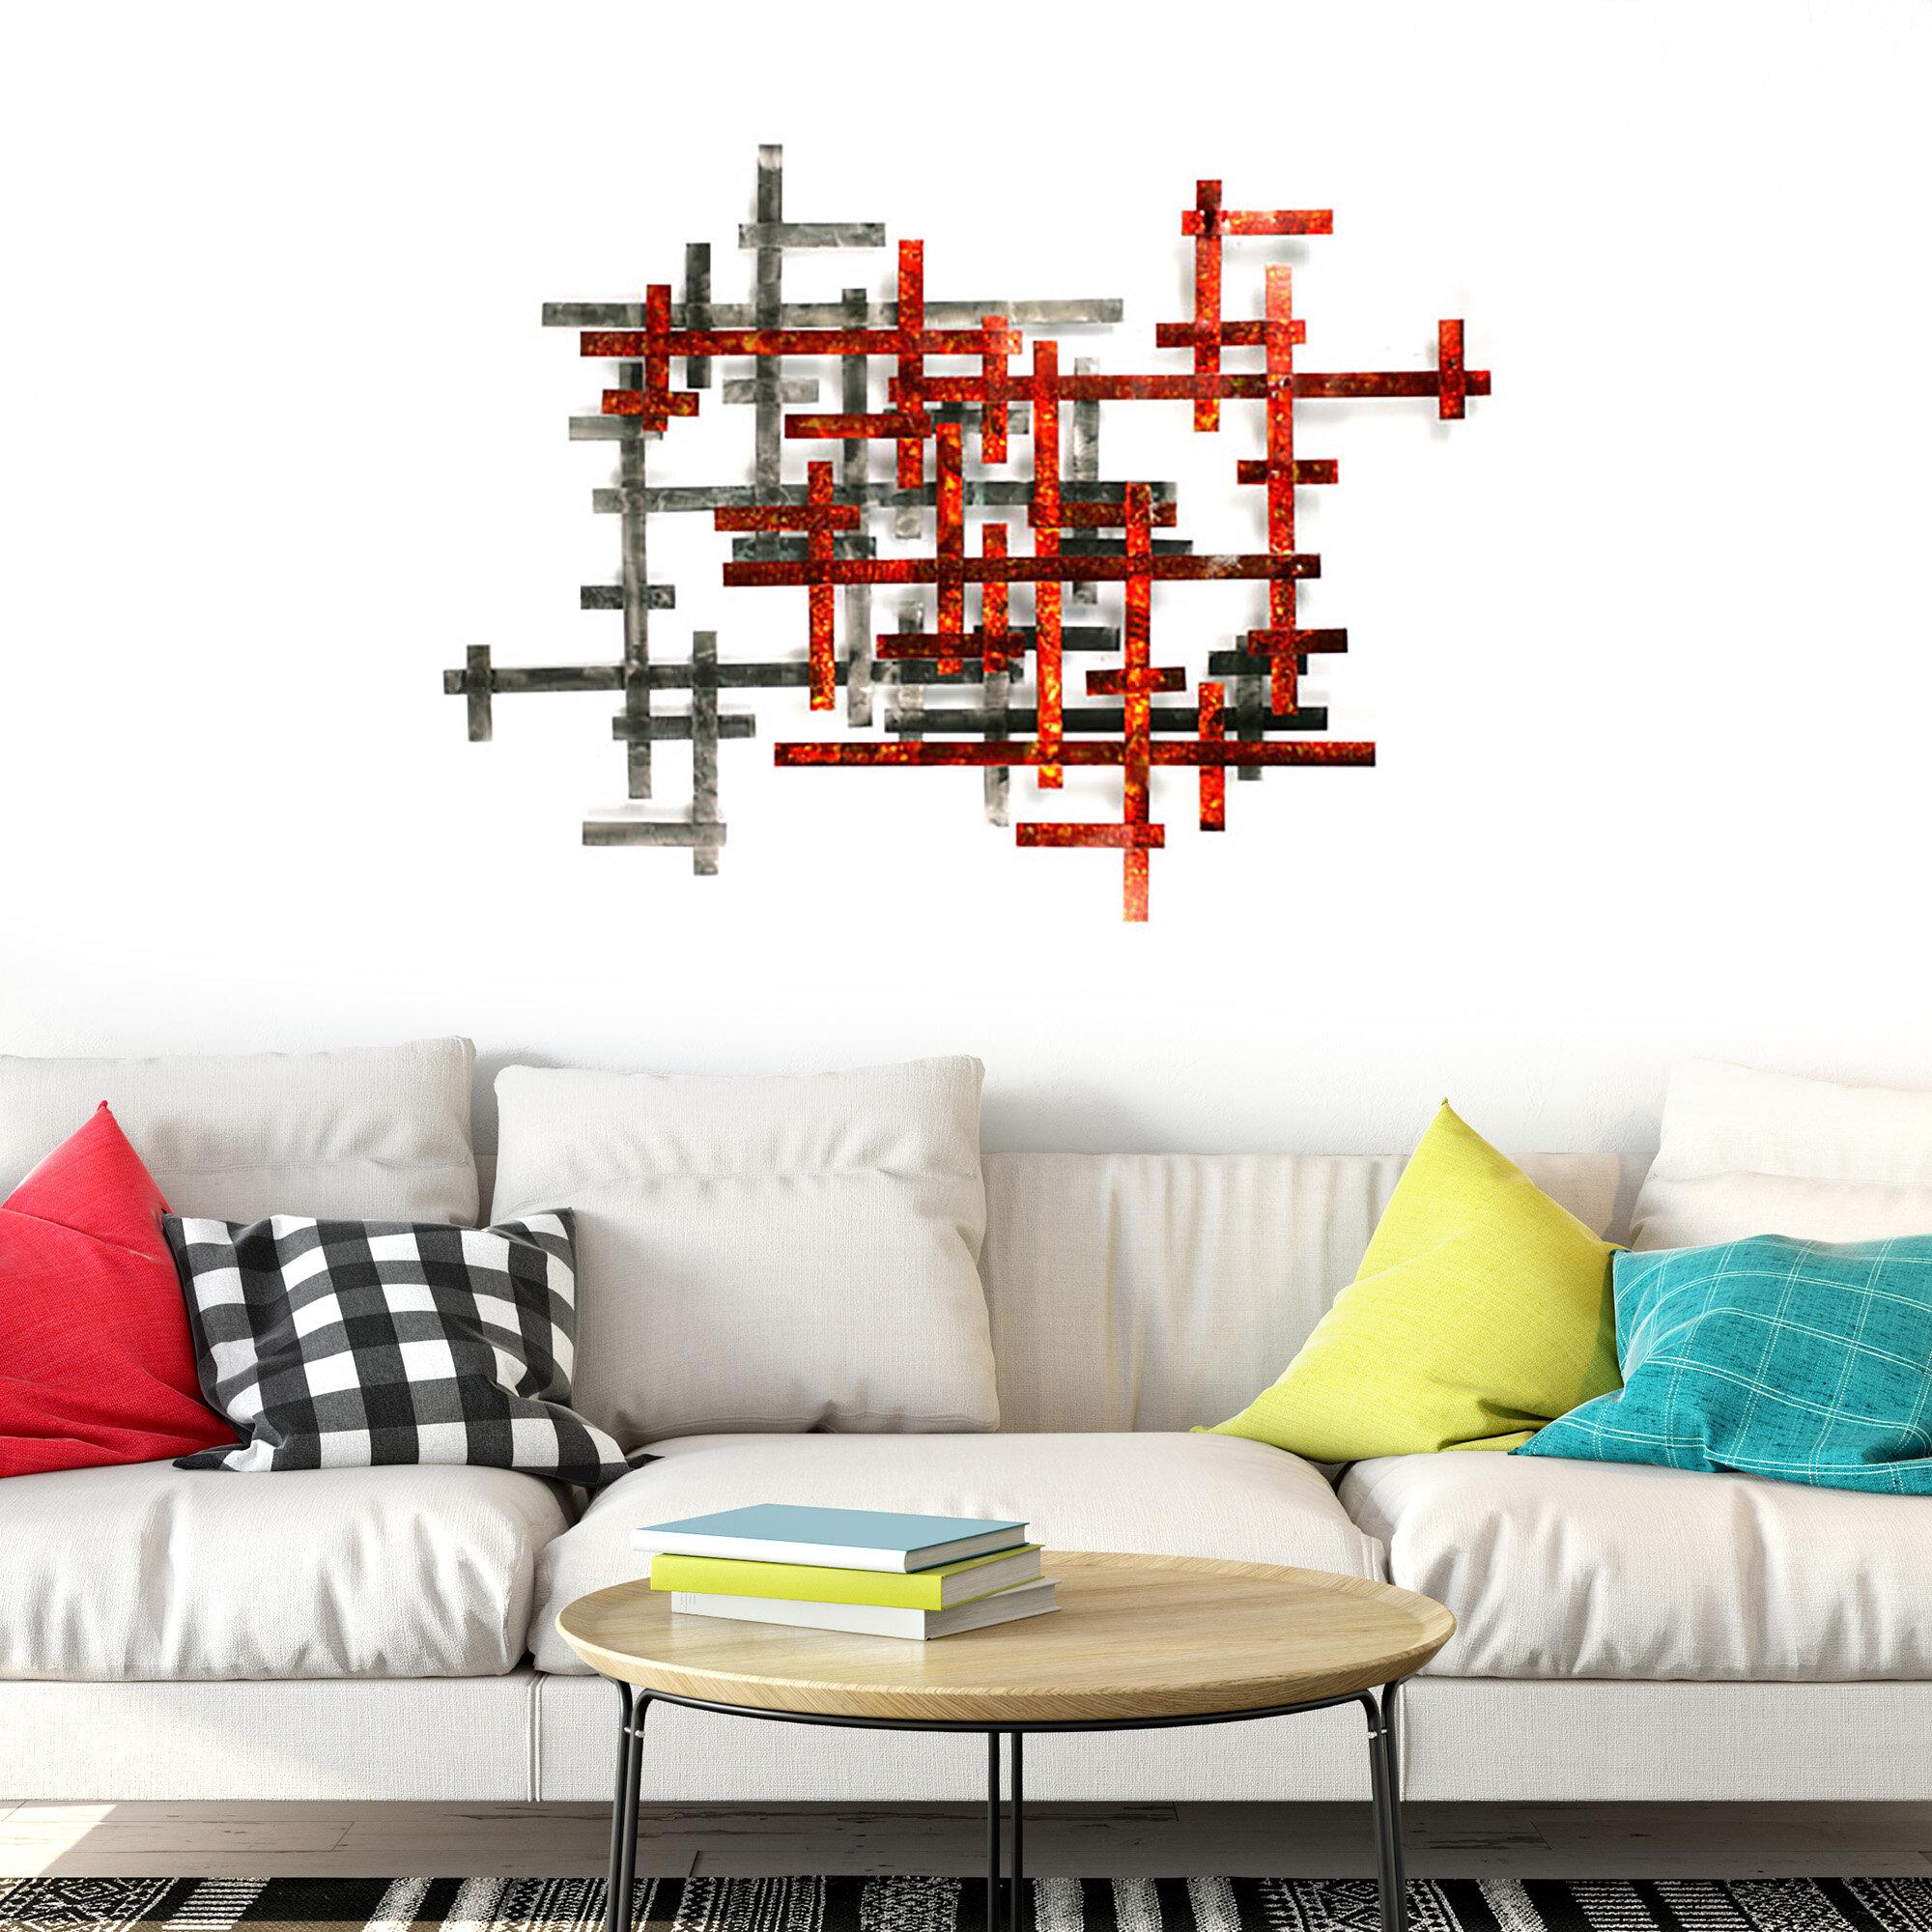 Ebern Designs Aesthetic Metal Wall Decor